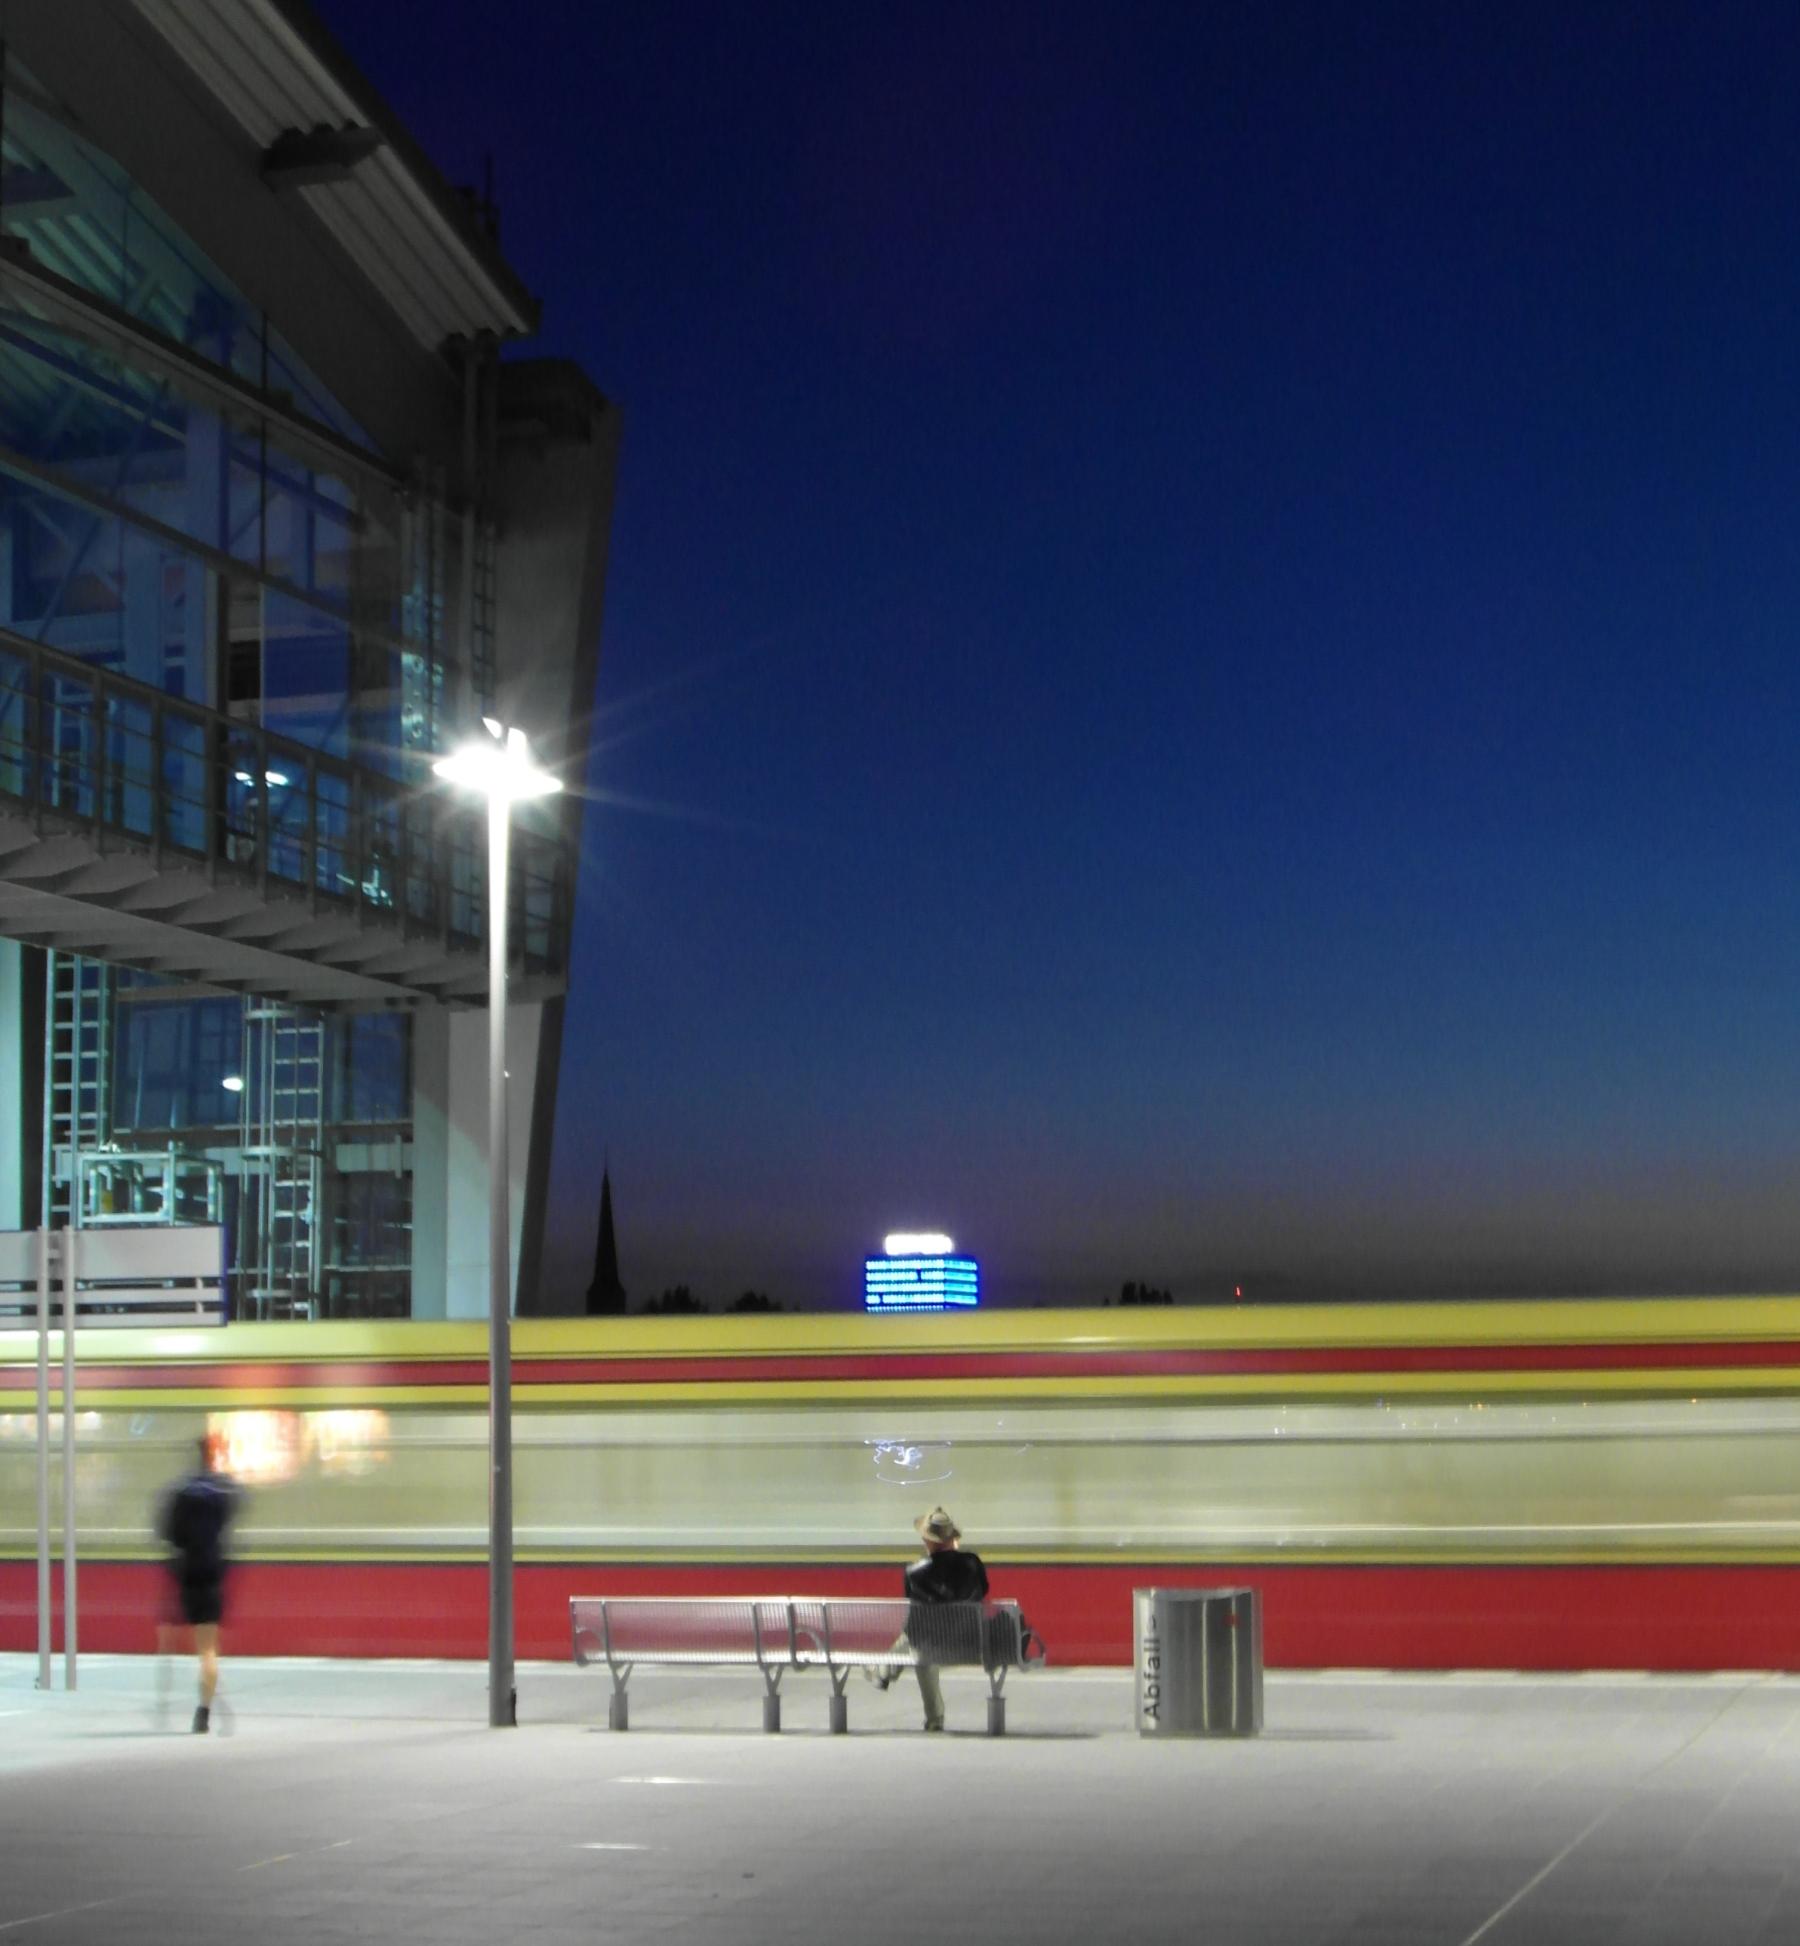 S-Bahn Berlin Ostkreuz Nachtaufnahme blur